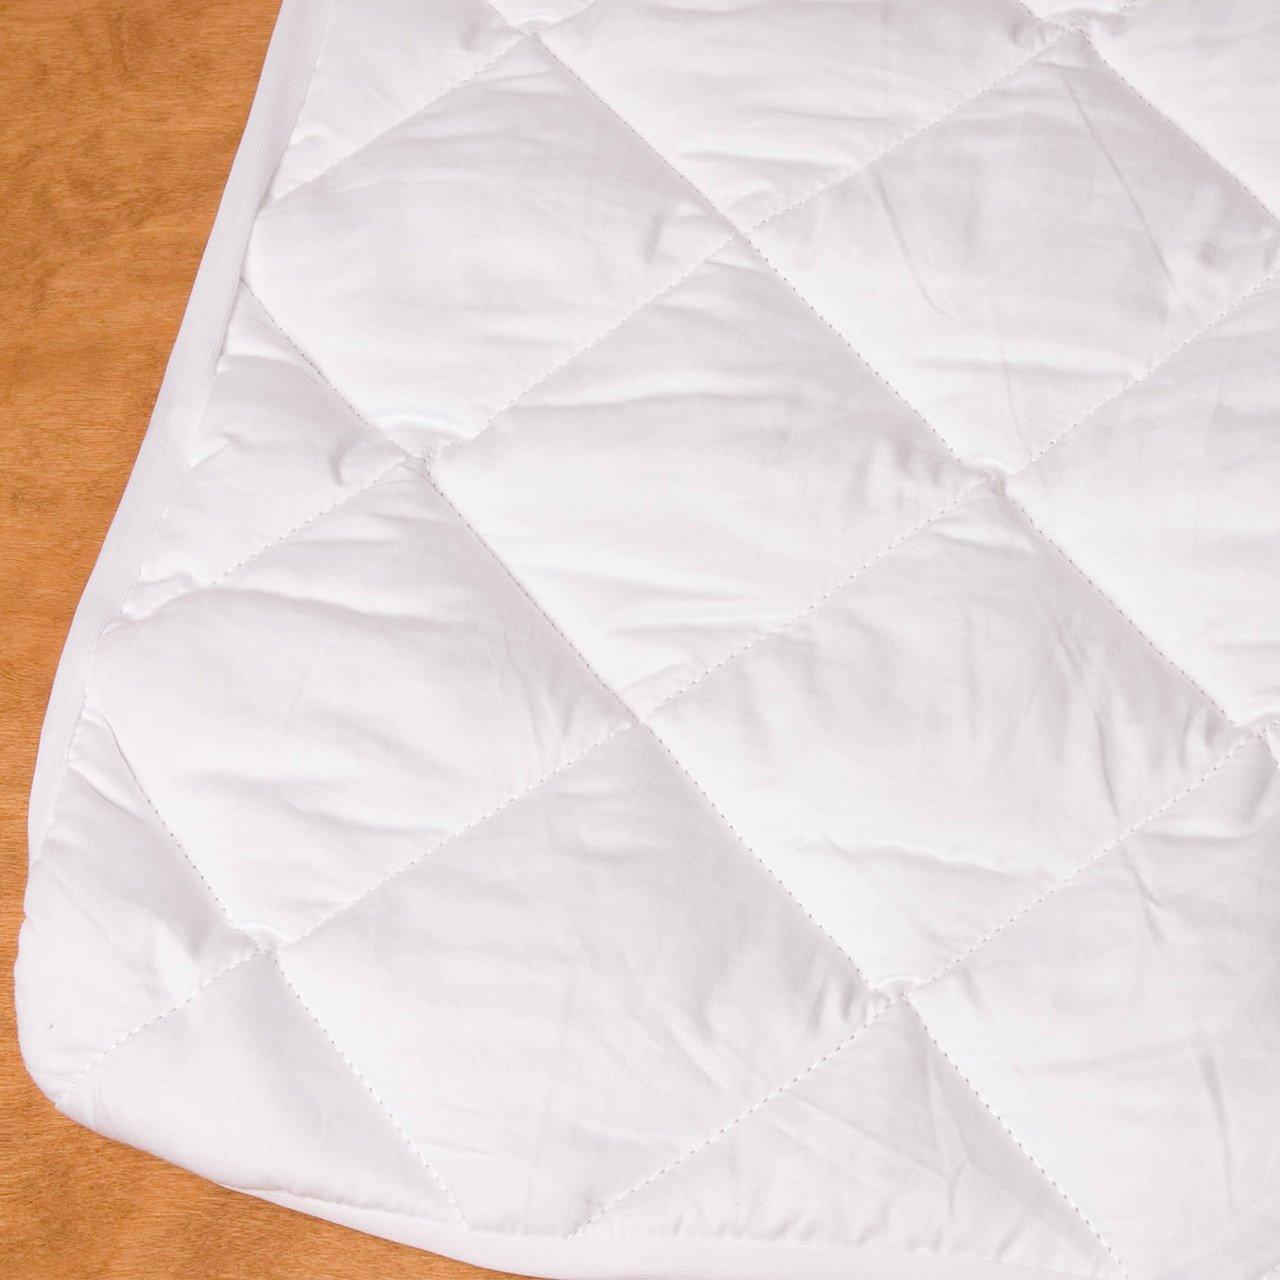 Bristol Hotel Pillowtop Mattress Pad Protector Cover - Full (54''x80'')